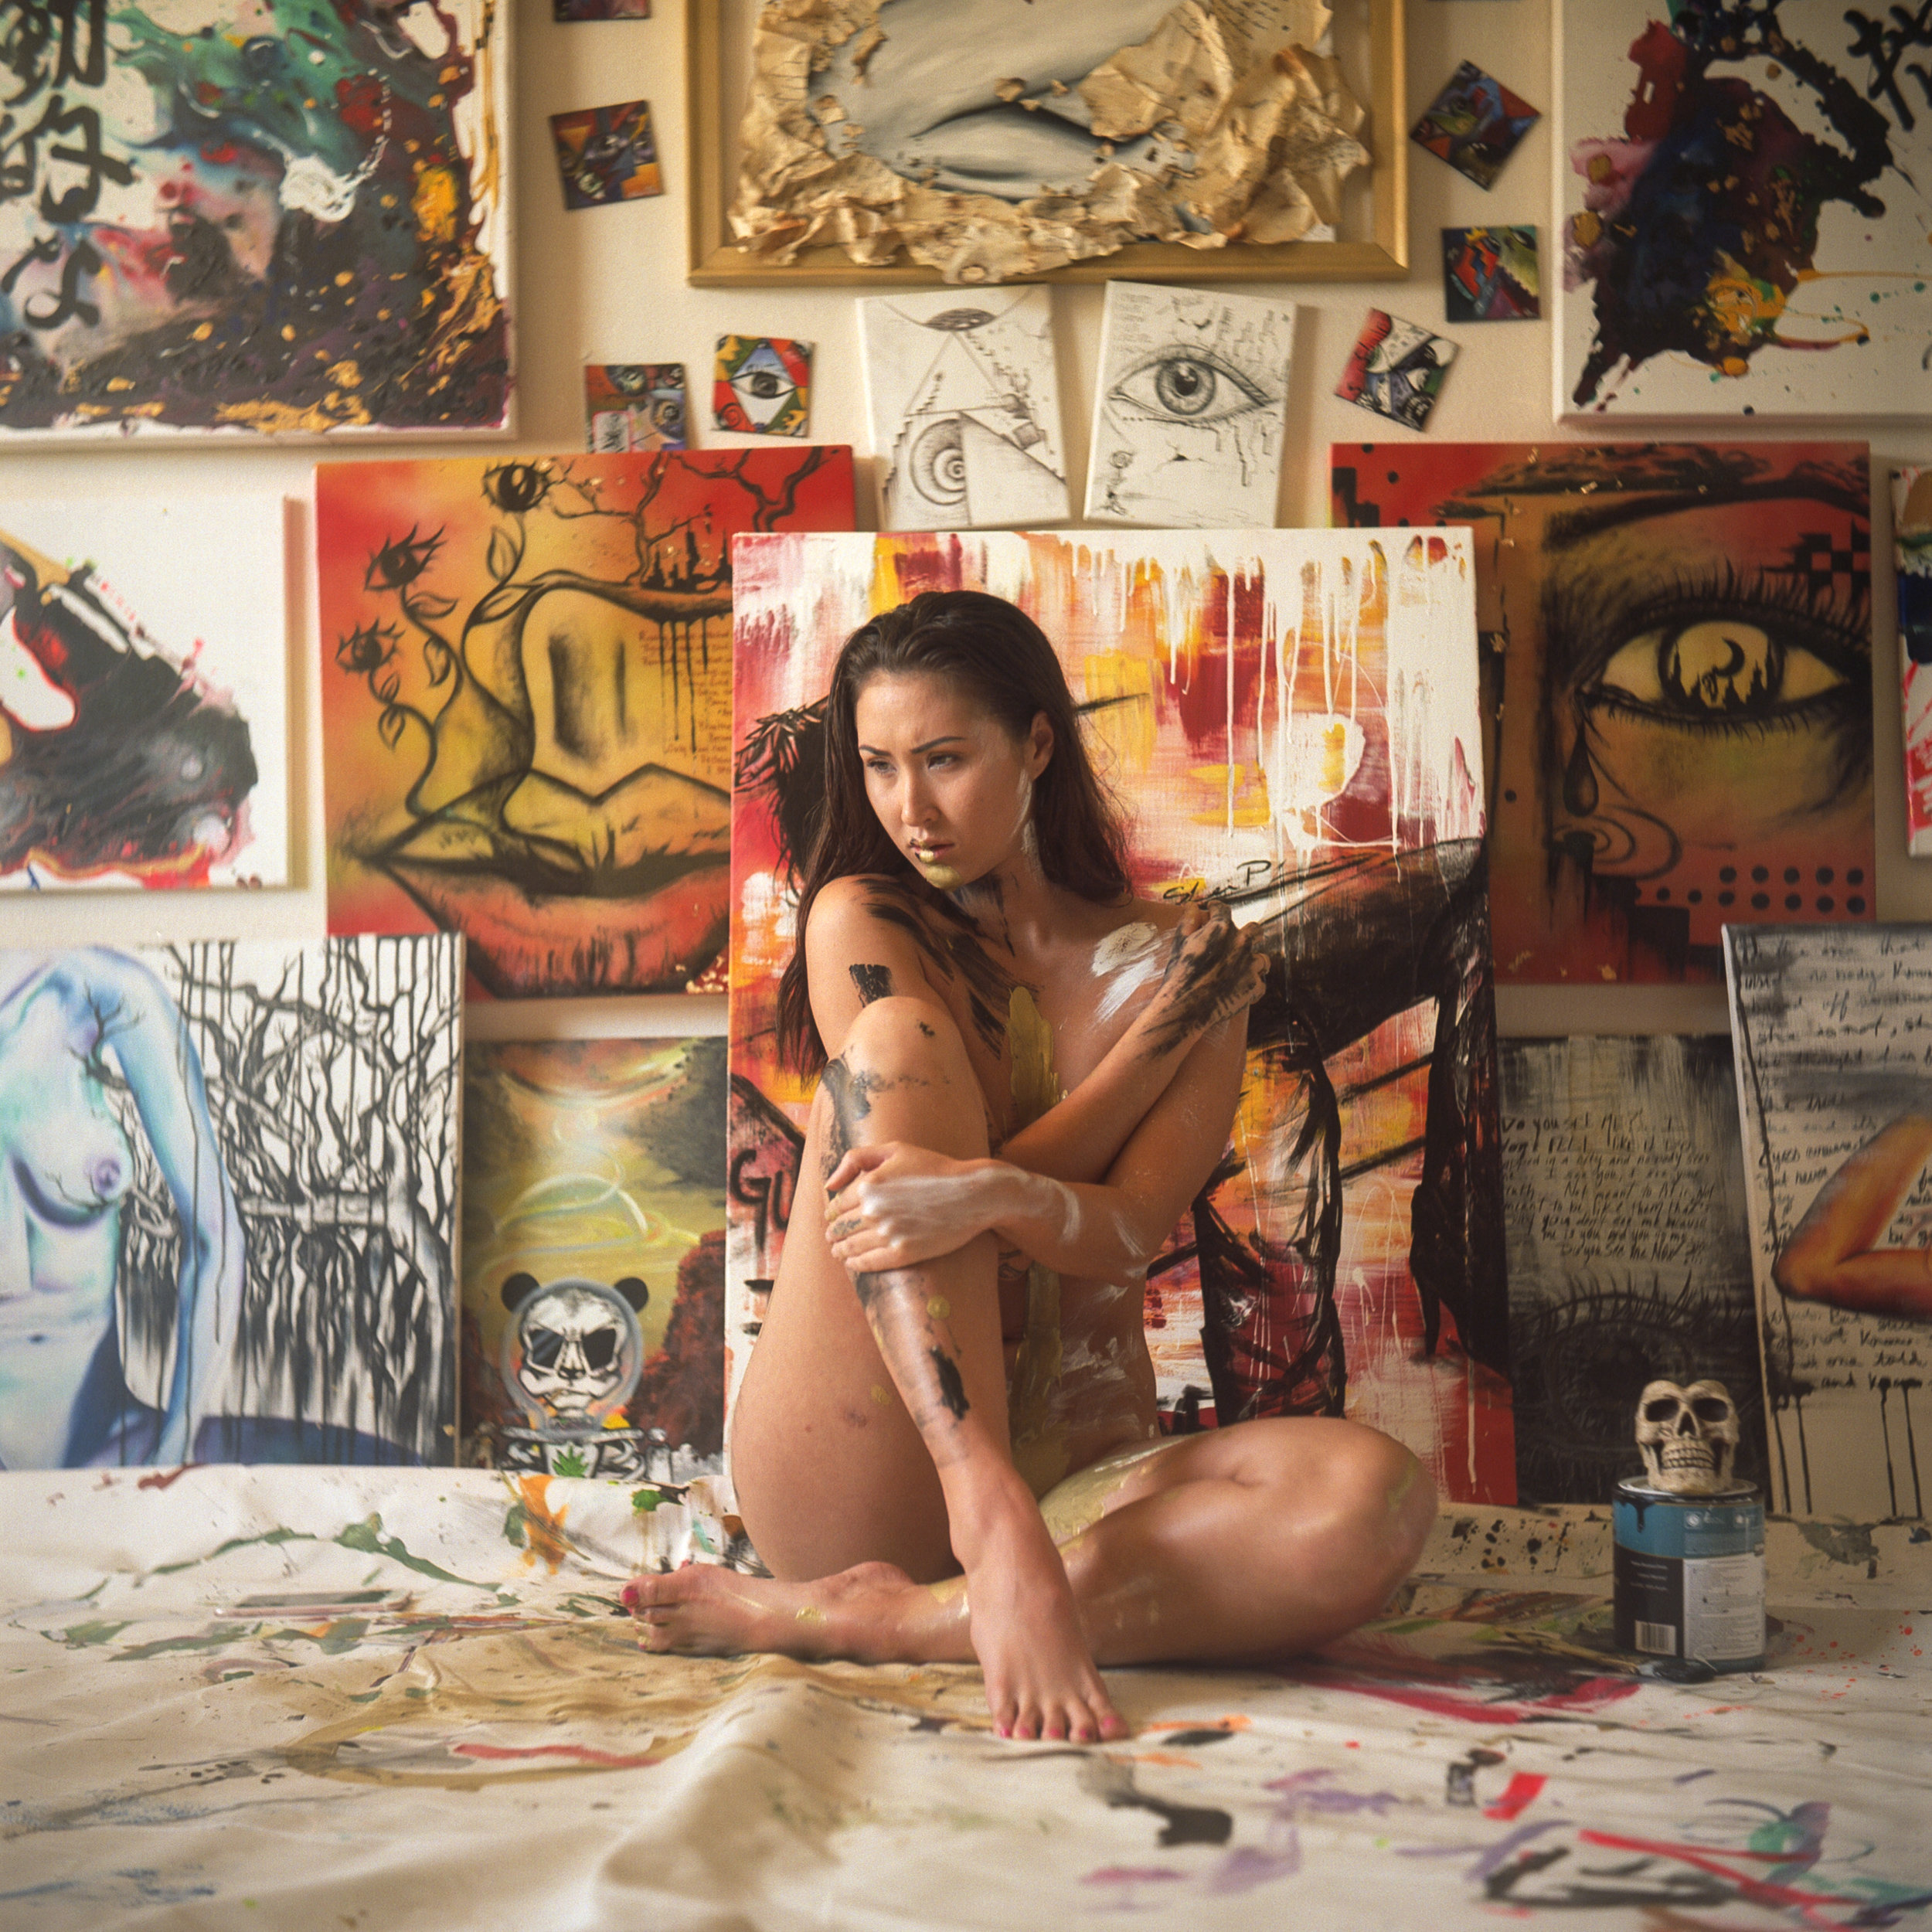 Shei Nude Prints-2.jpg